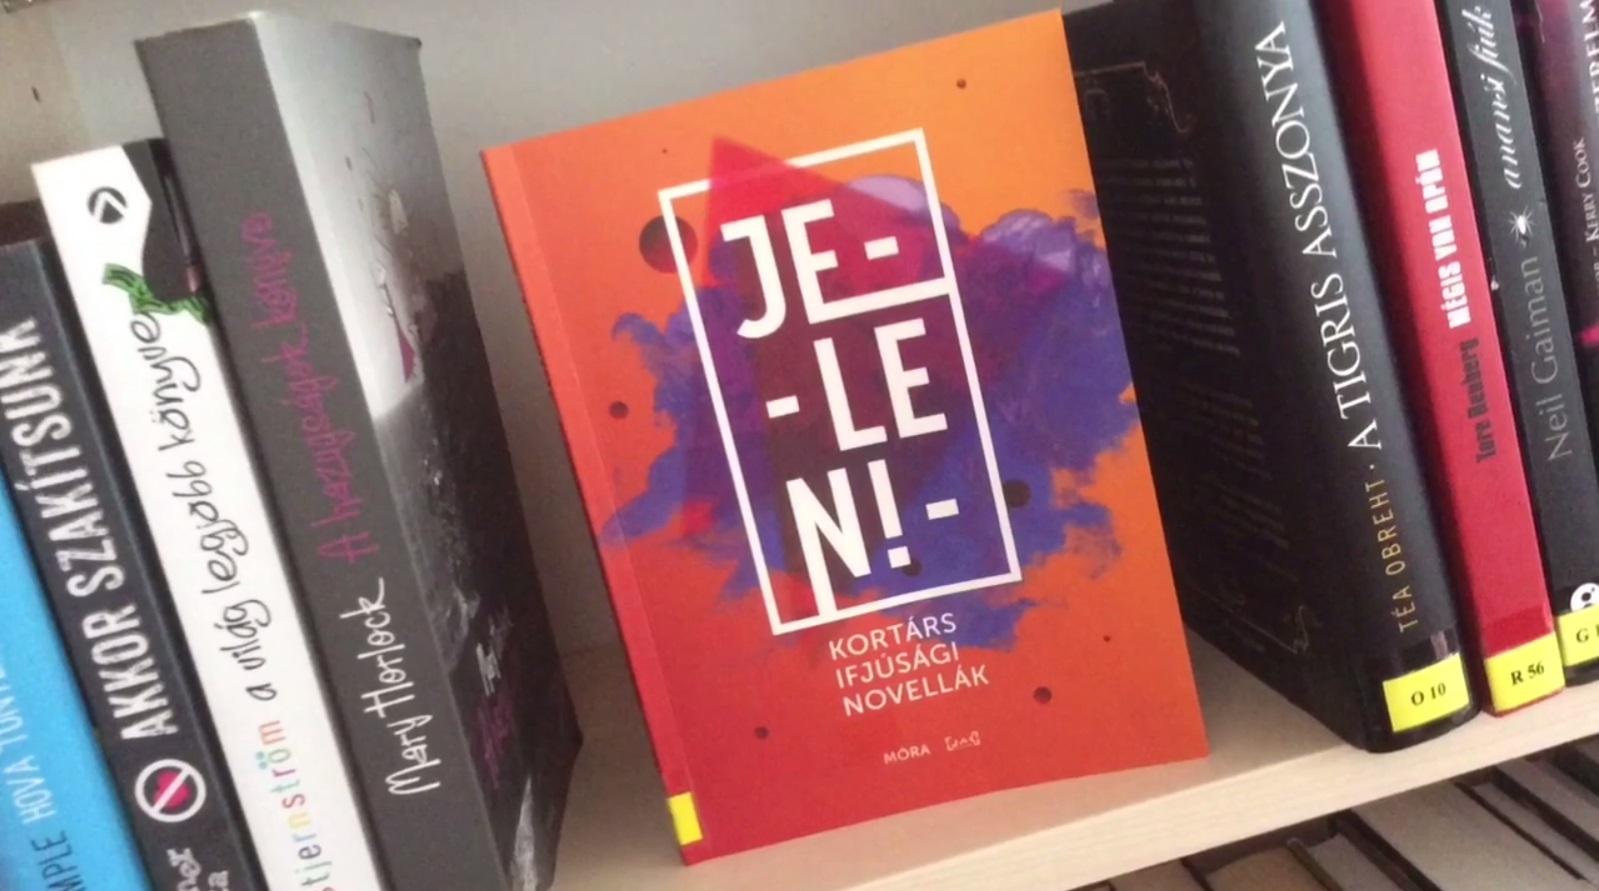 Jelen!-könyvtrailer Vol. 3 by Kriszti & Rebi